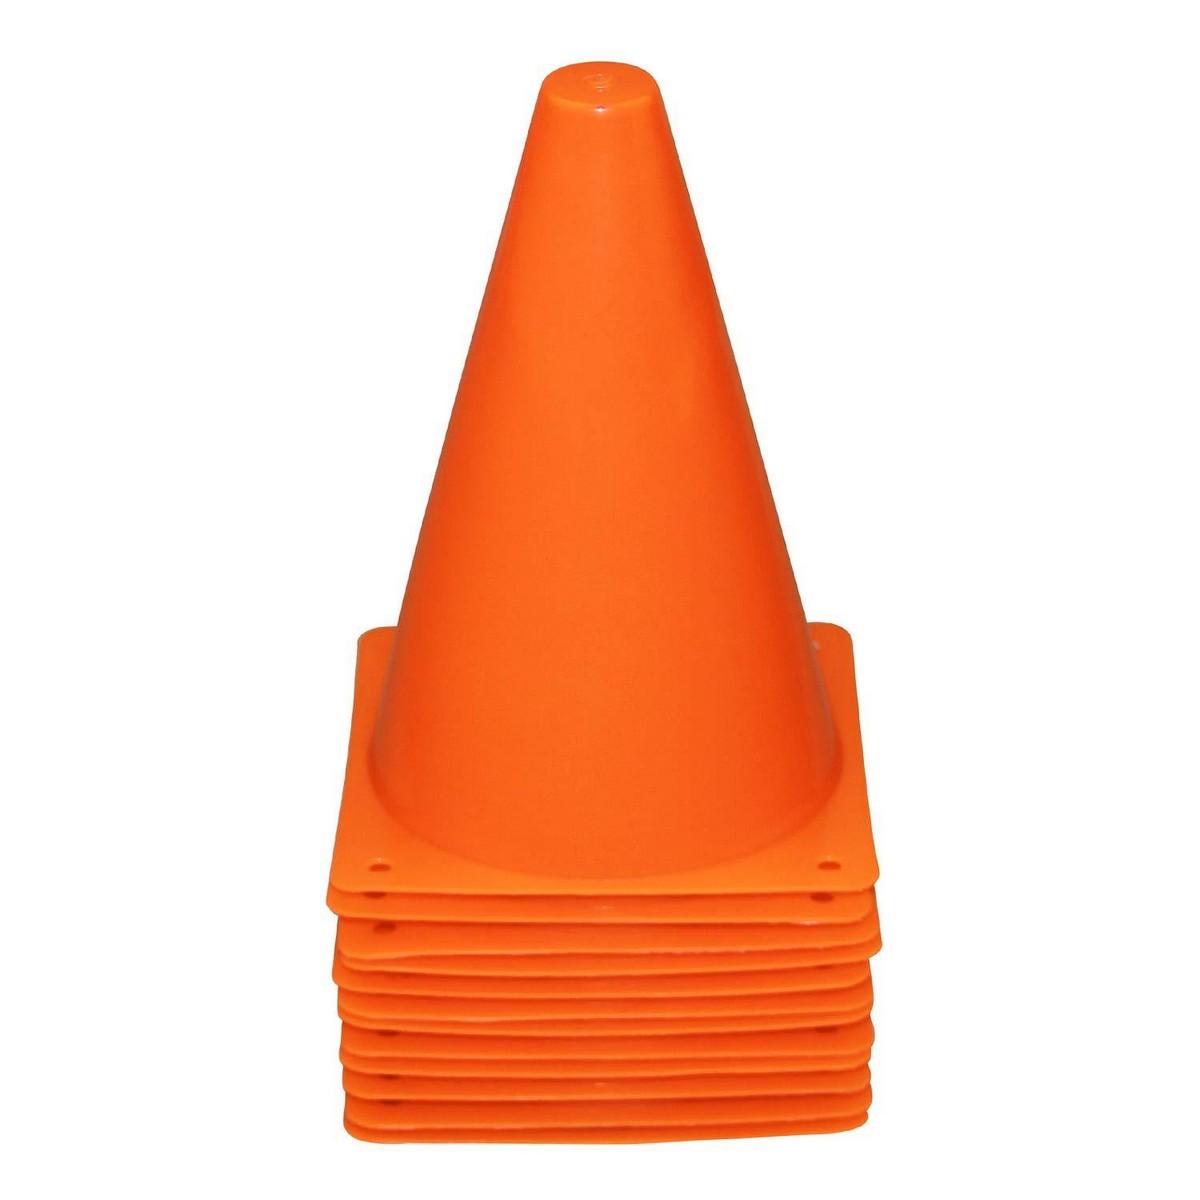 "Set of 10 - 6"" PVC Plastic Sport Training Traffic Cone"